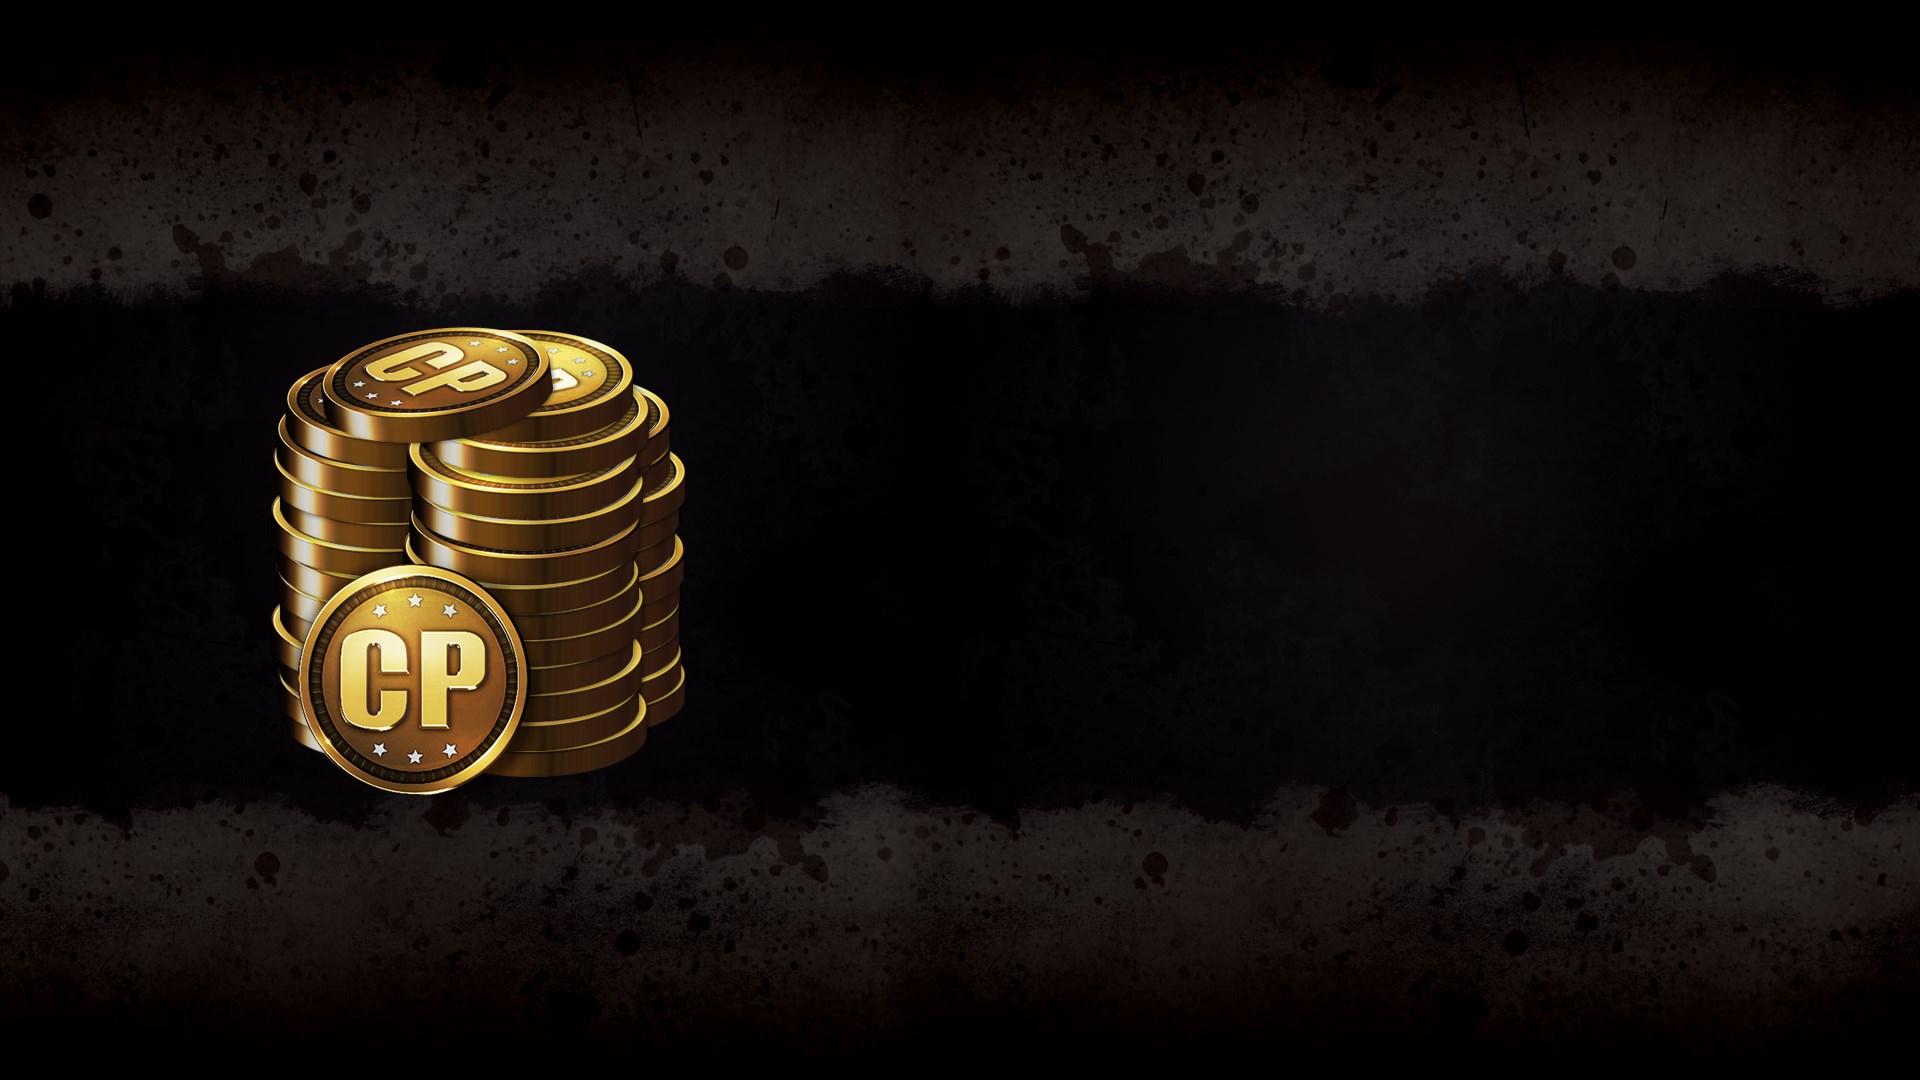 13,000 Call of Duty®: Infinite Warfare Points